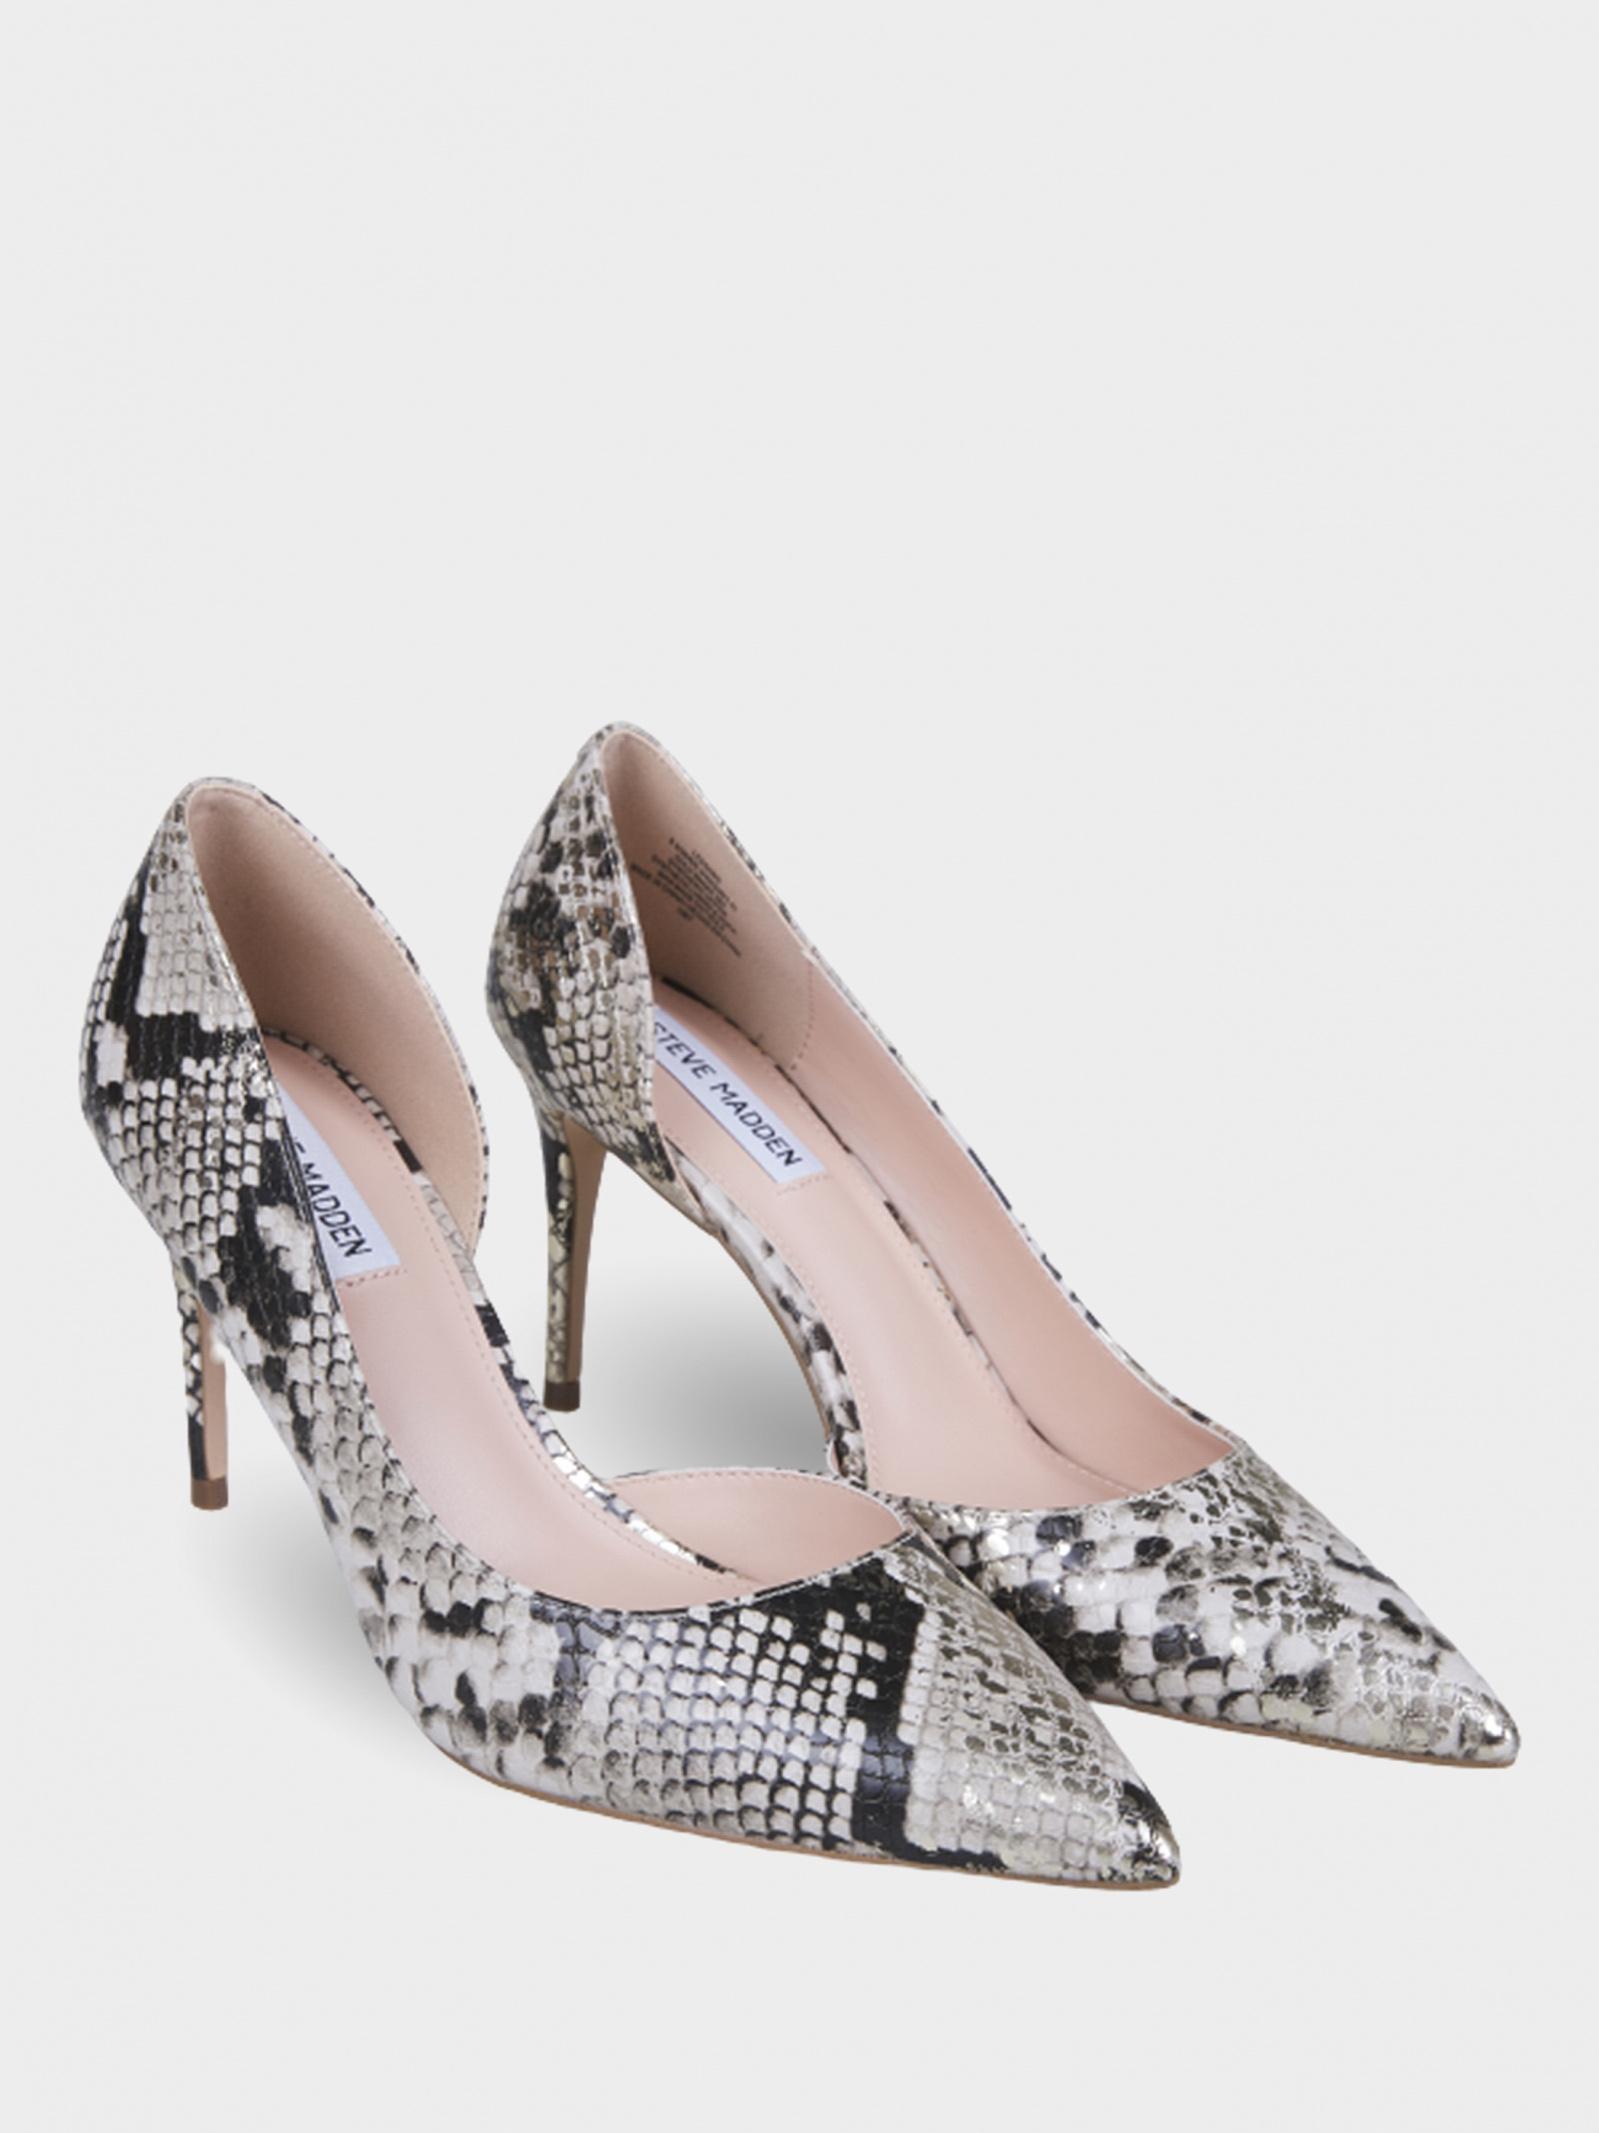 Туфлі  жіночі Steve Madden LESSONS SM11000961 GOLD SNAKE розмірна сітка взуття, 2017